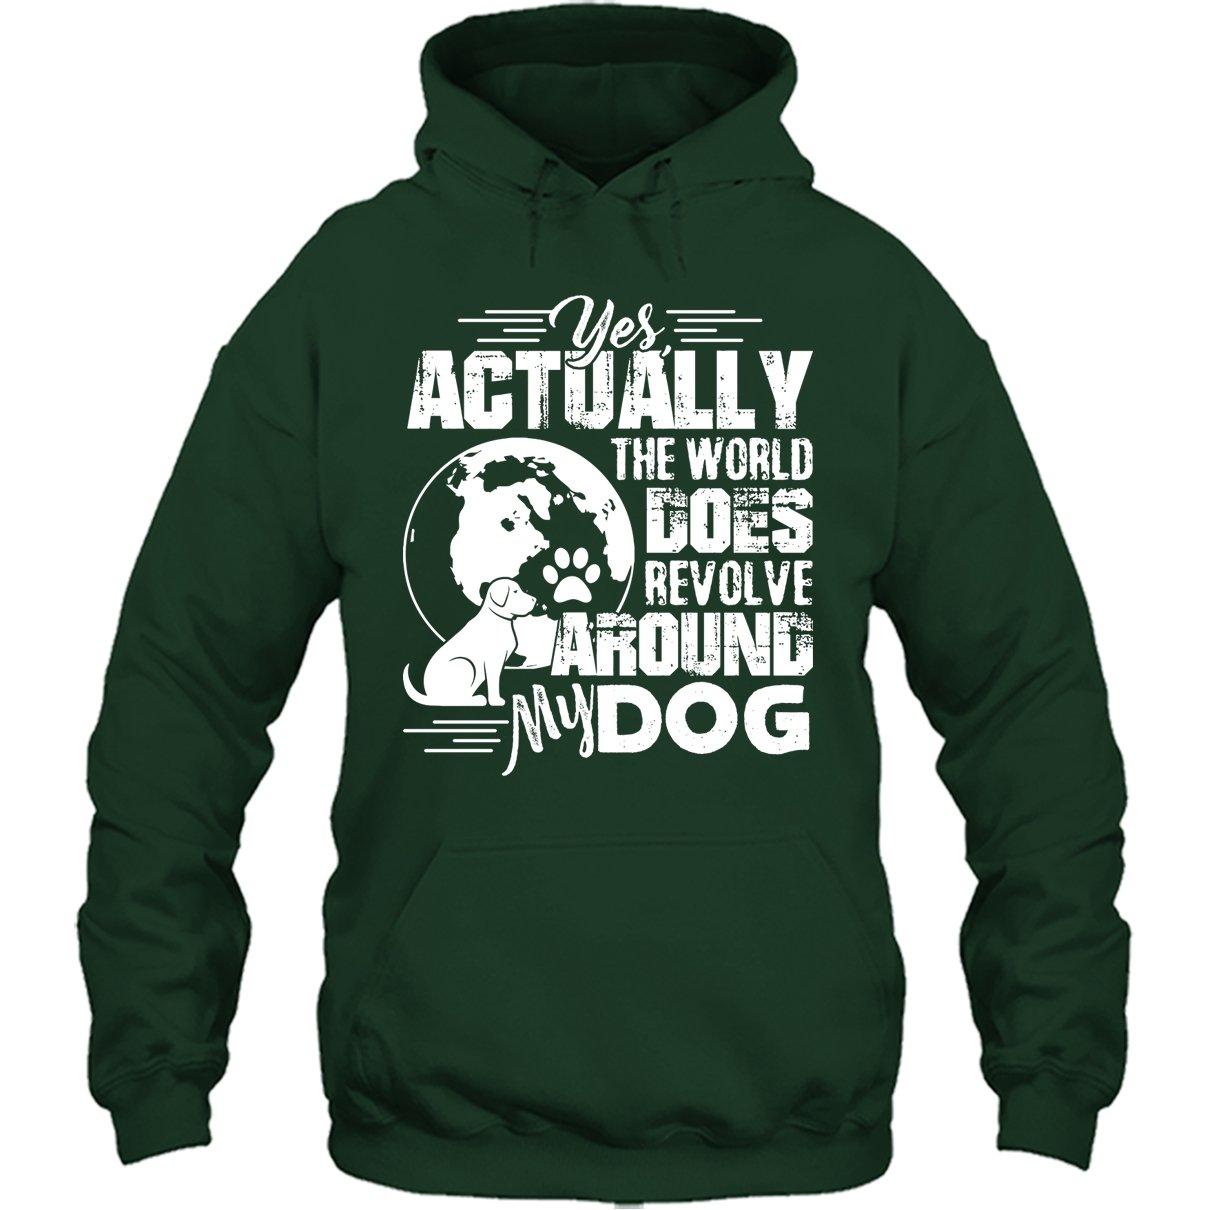 The World Revolve Around My Dog Tee Shirt Design for Men and Women Dog Cool Tshirt